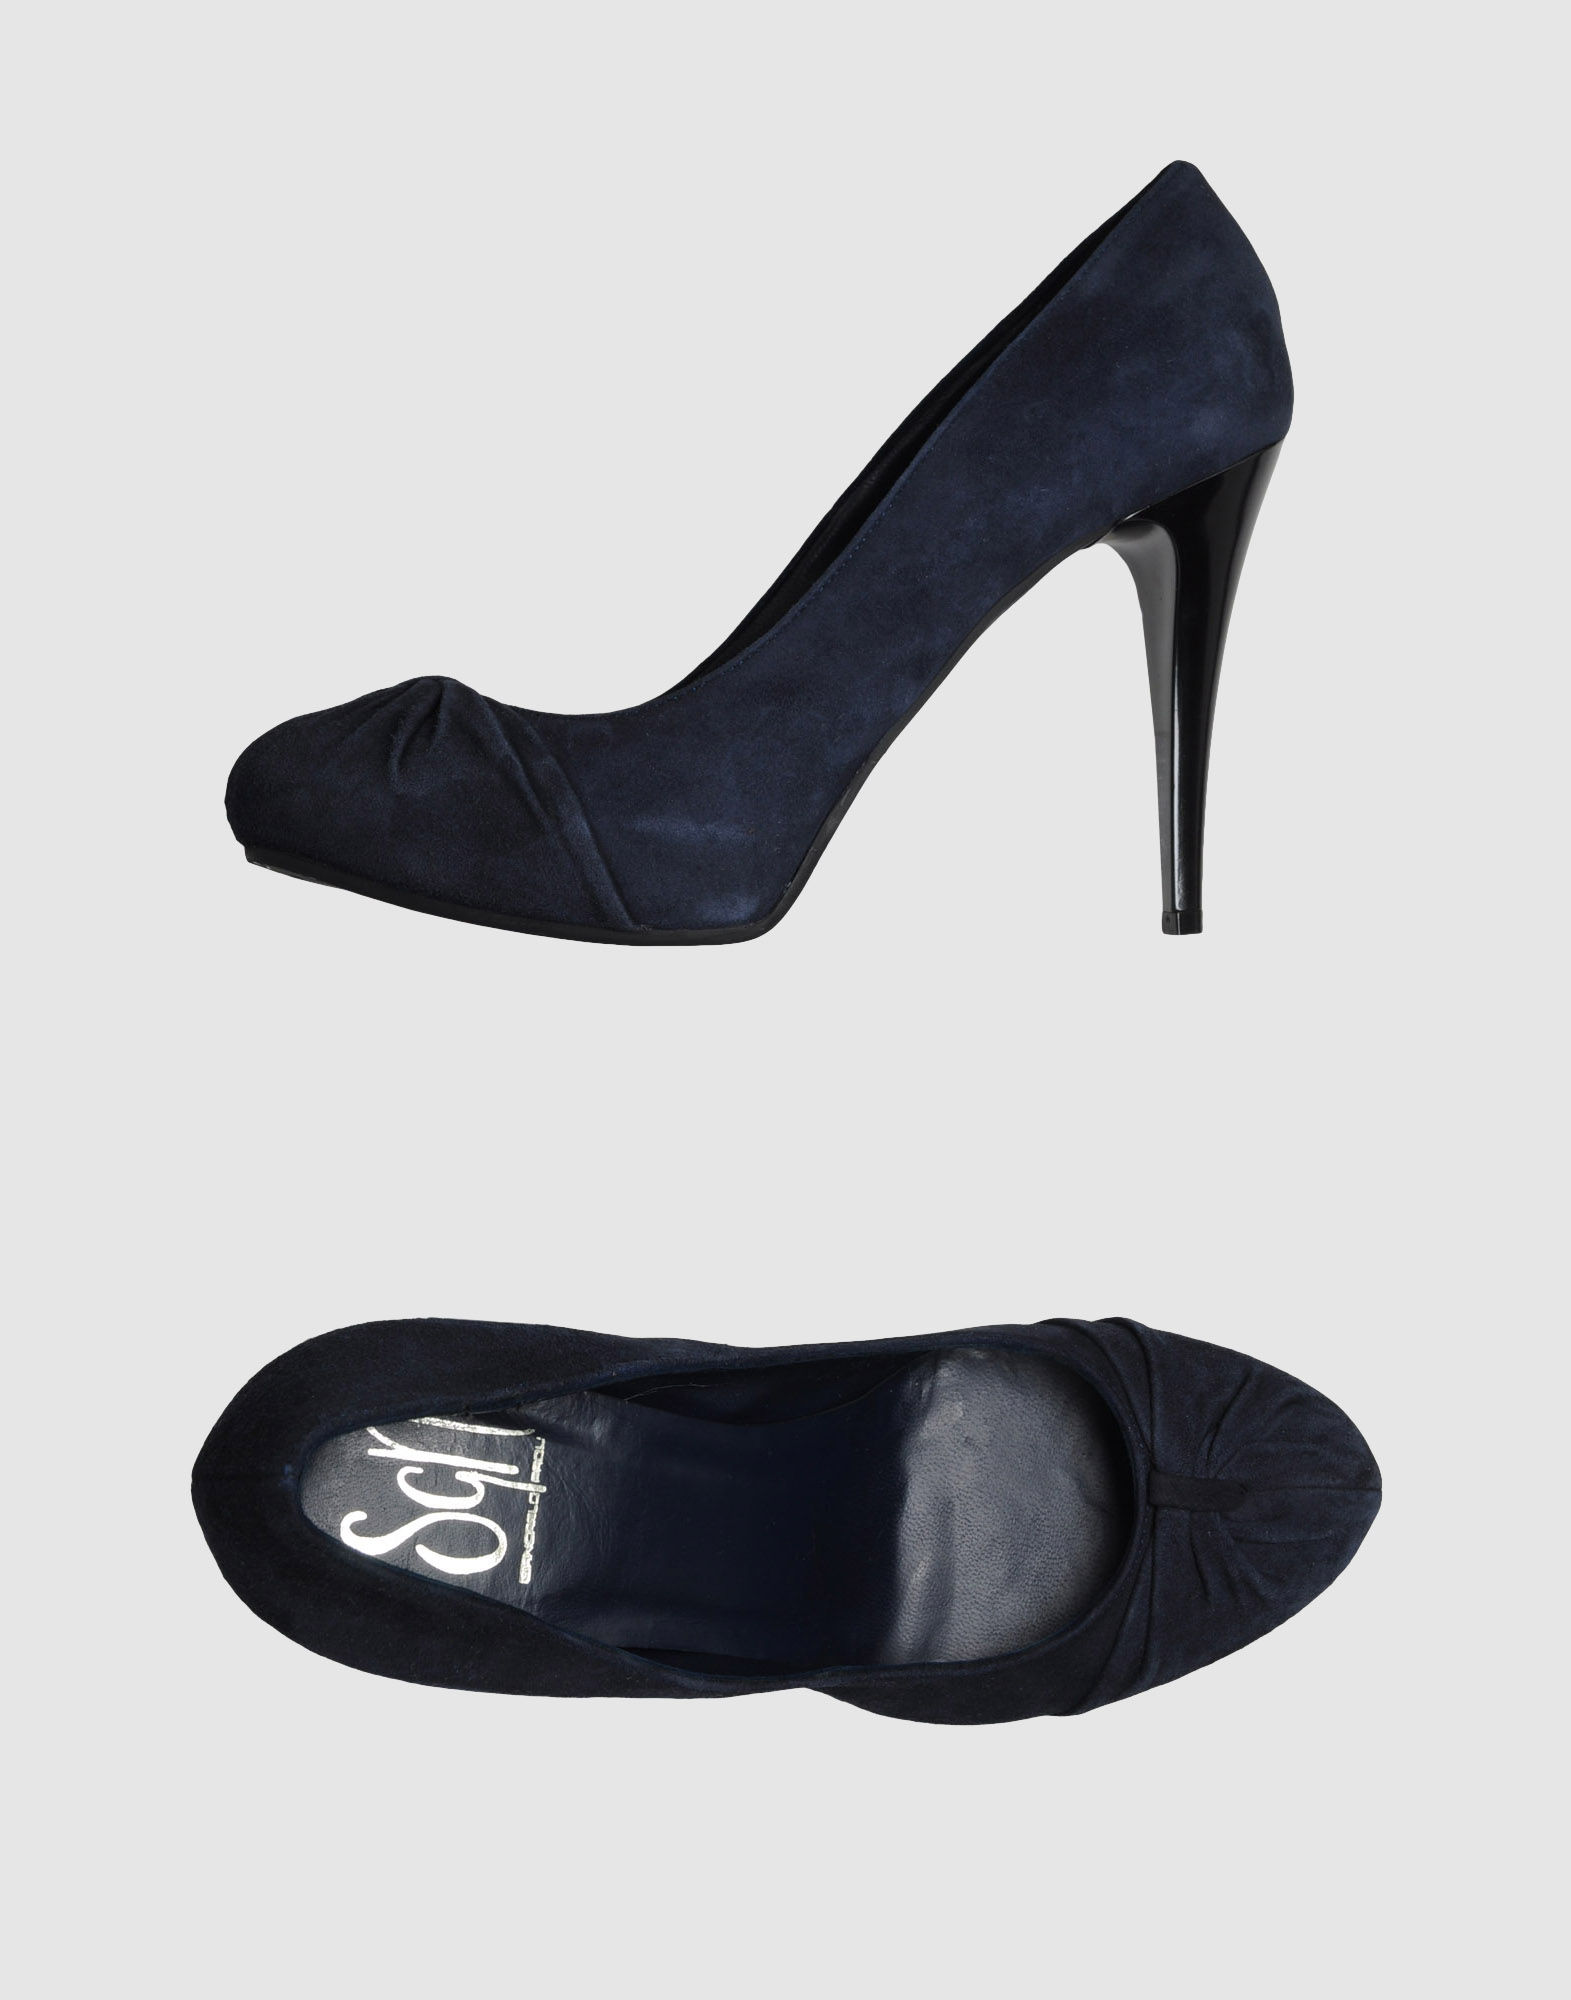 SGN GIANCARLO PAOLI Туфли на платформе обувь на высокой платформе 1405103495245 2015